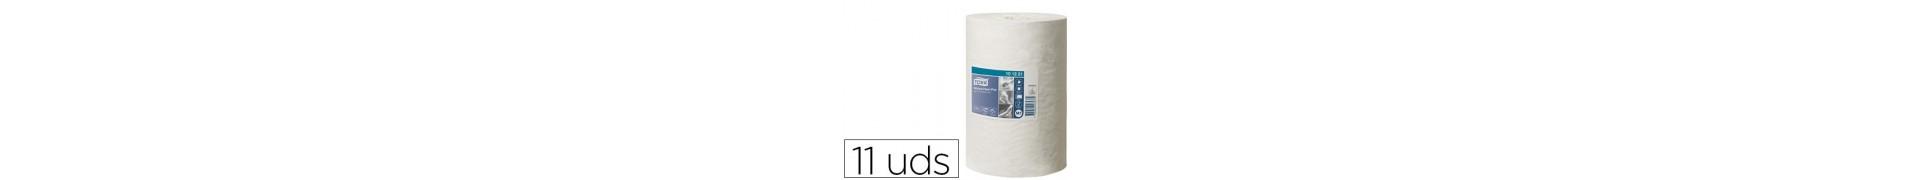 Pañuelo/papel higiénico/toalla